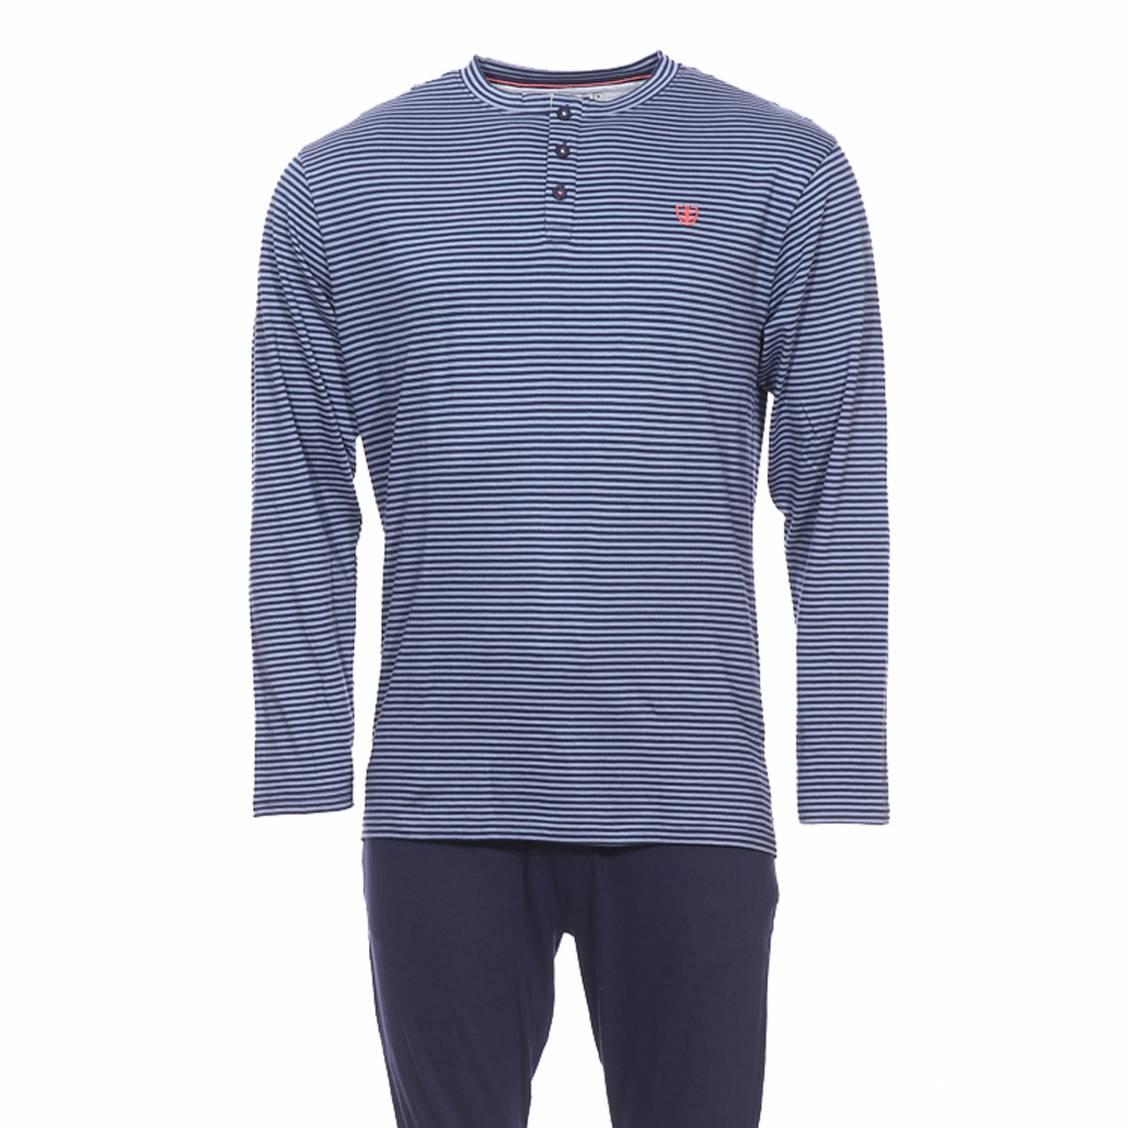 0e02695caa79 Pyjama long Mariner en jersey de coton   tee-shirt manches longues col  tunisien à ...